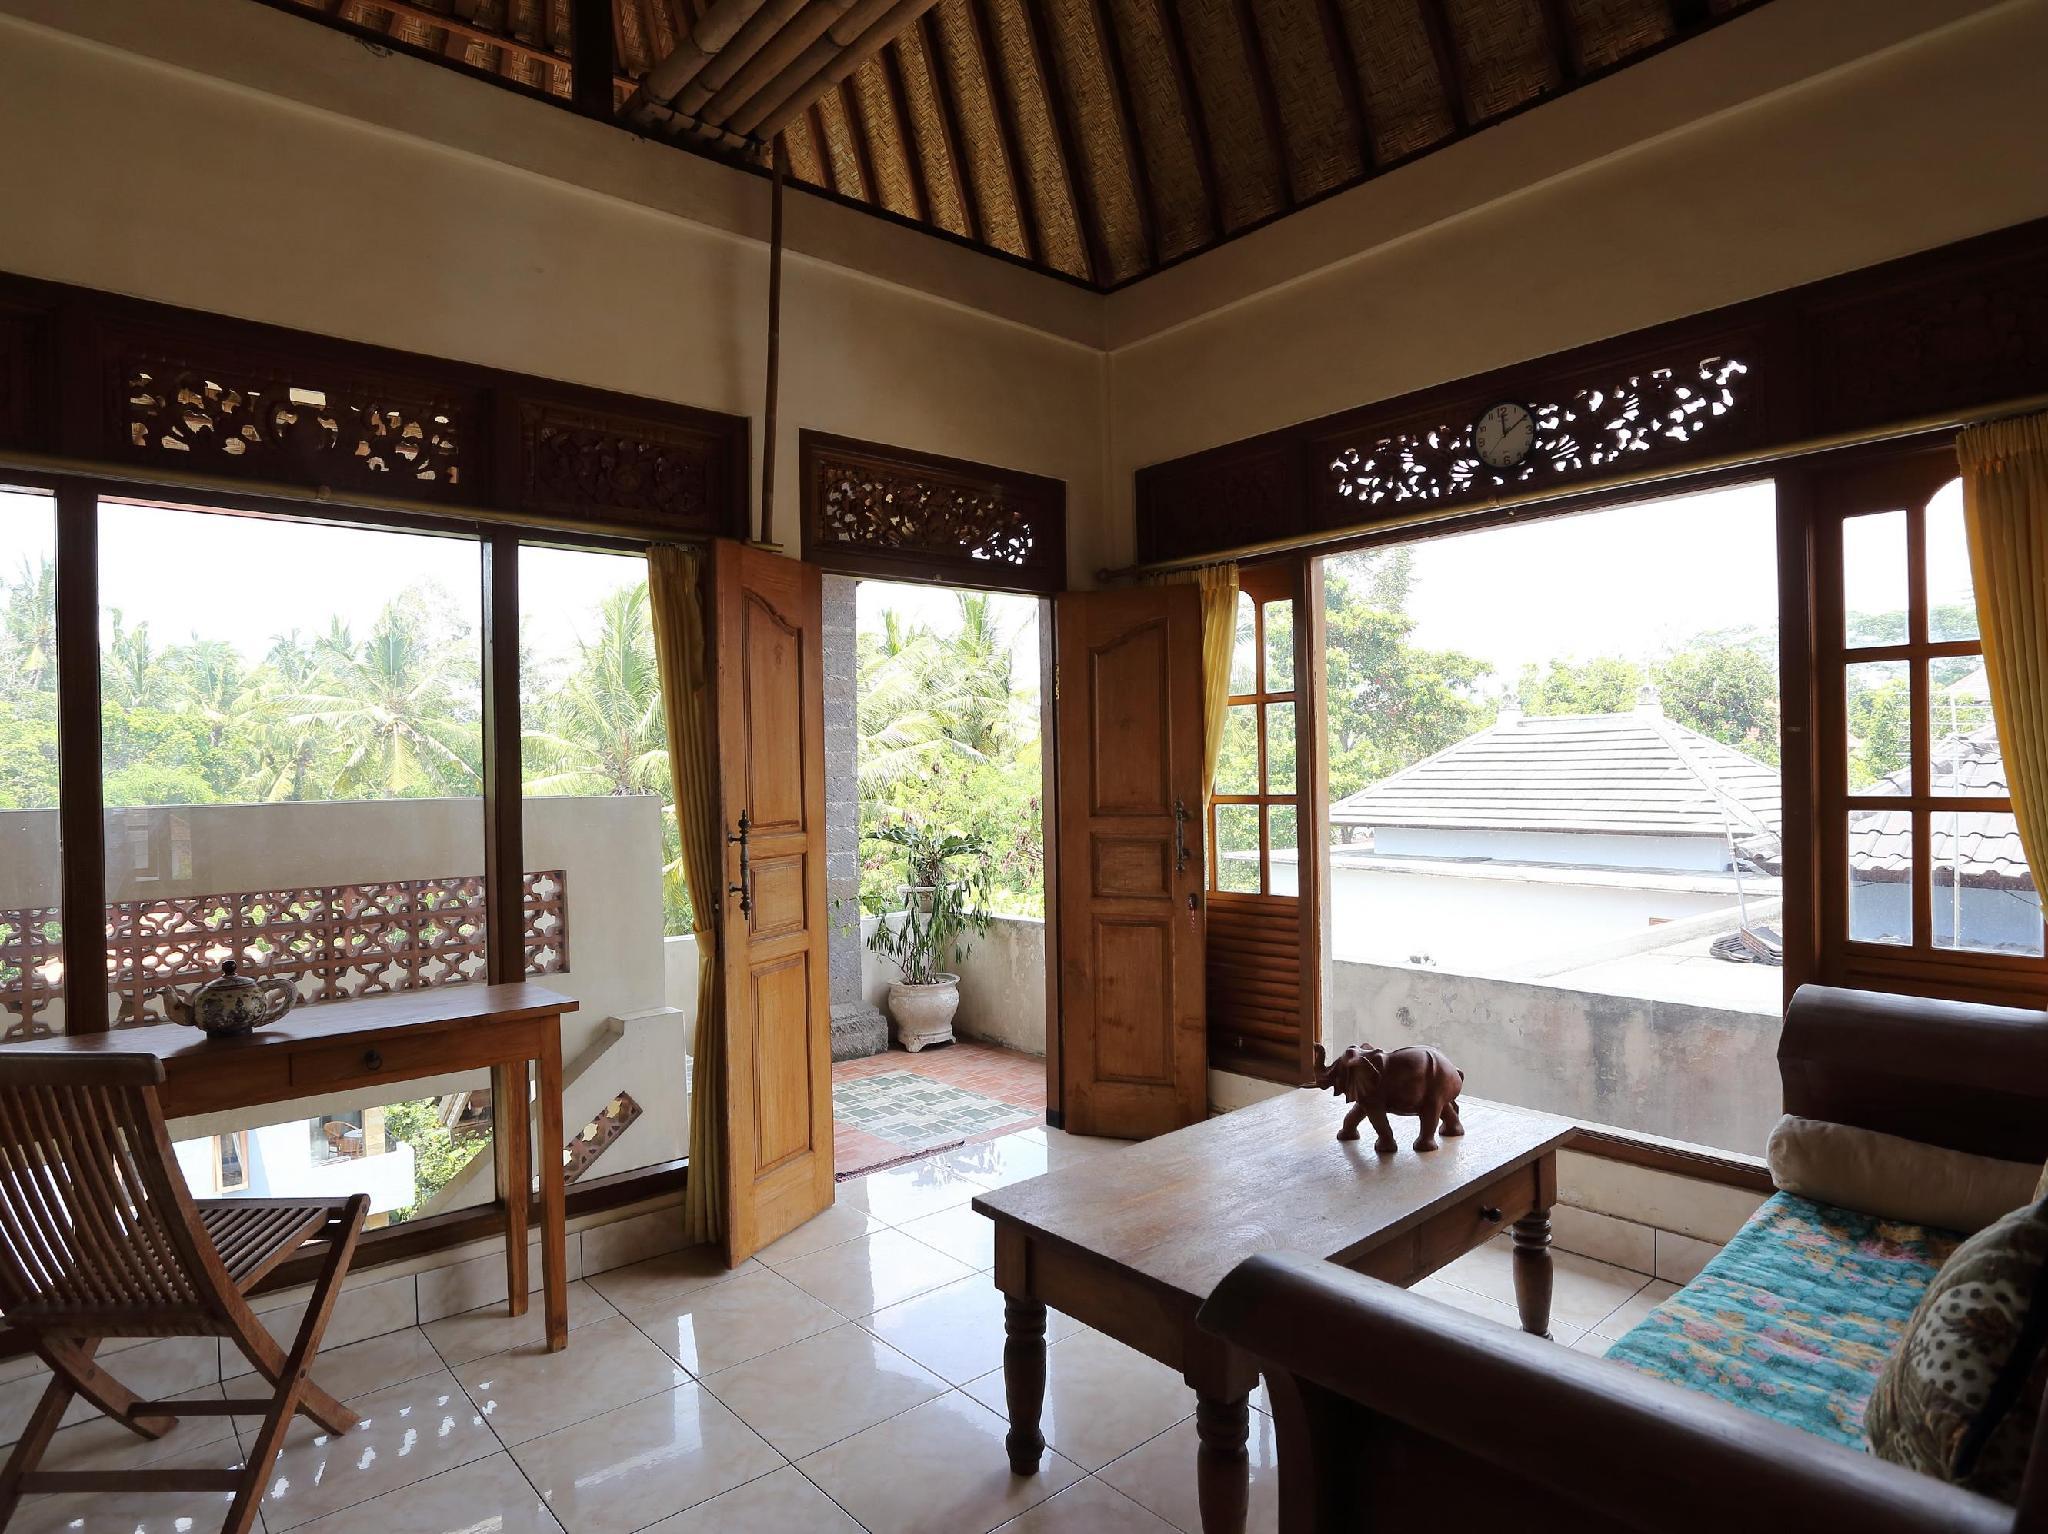 Hotel Artja Inn 2 - Jalan Kajeng no 9 - Bali